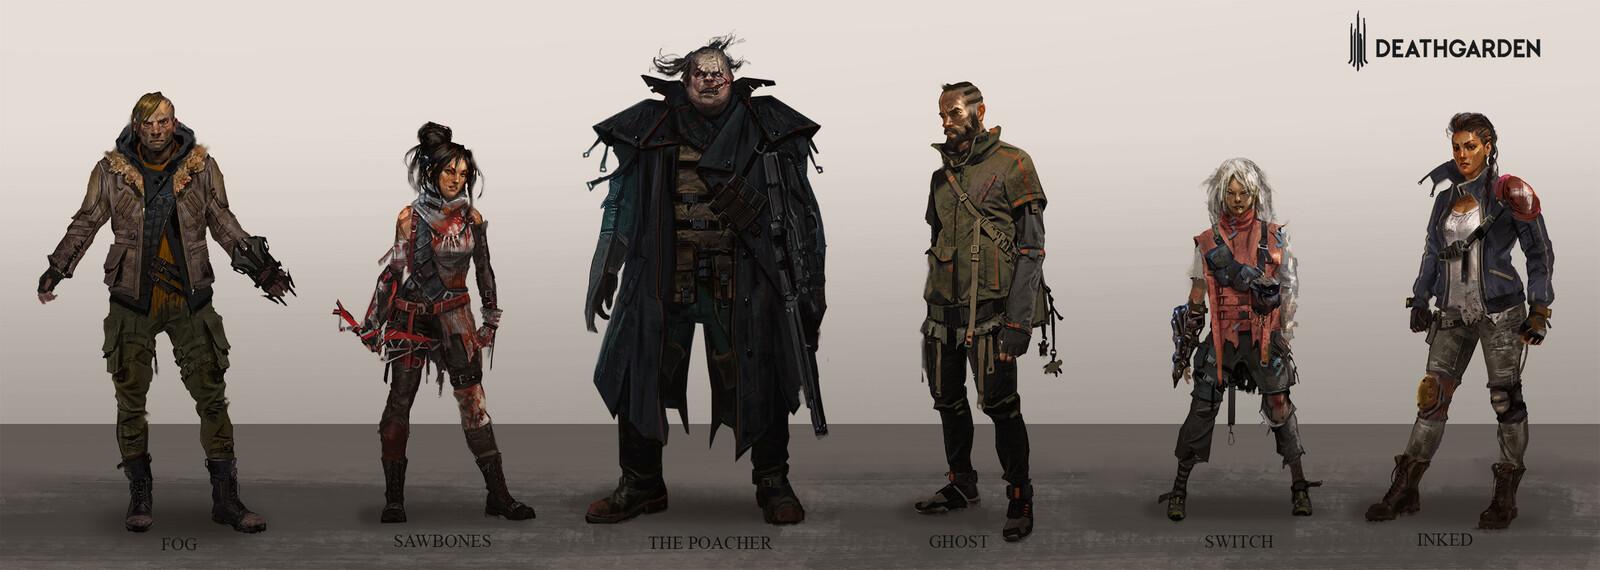 DeathGarden character concepts